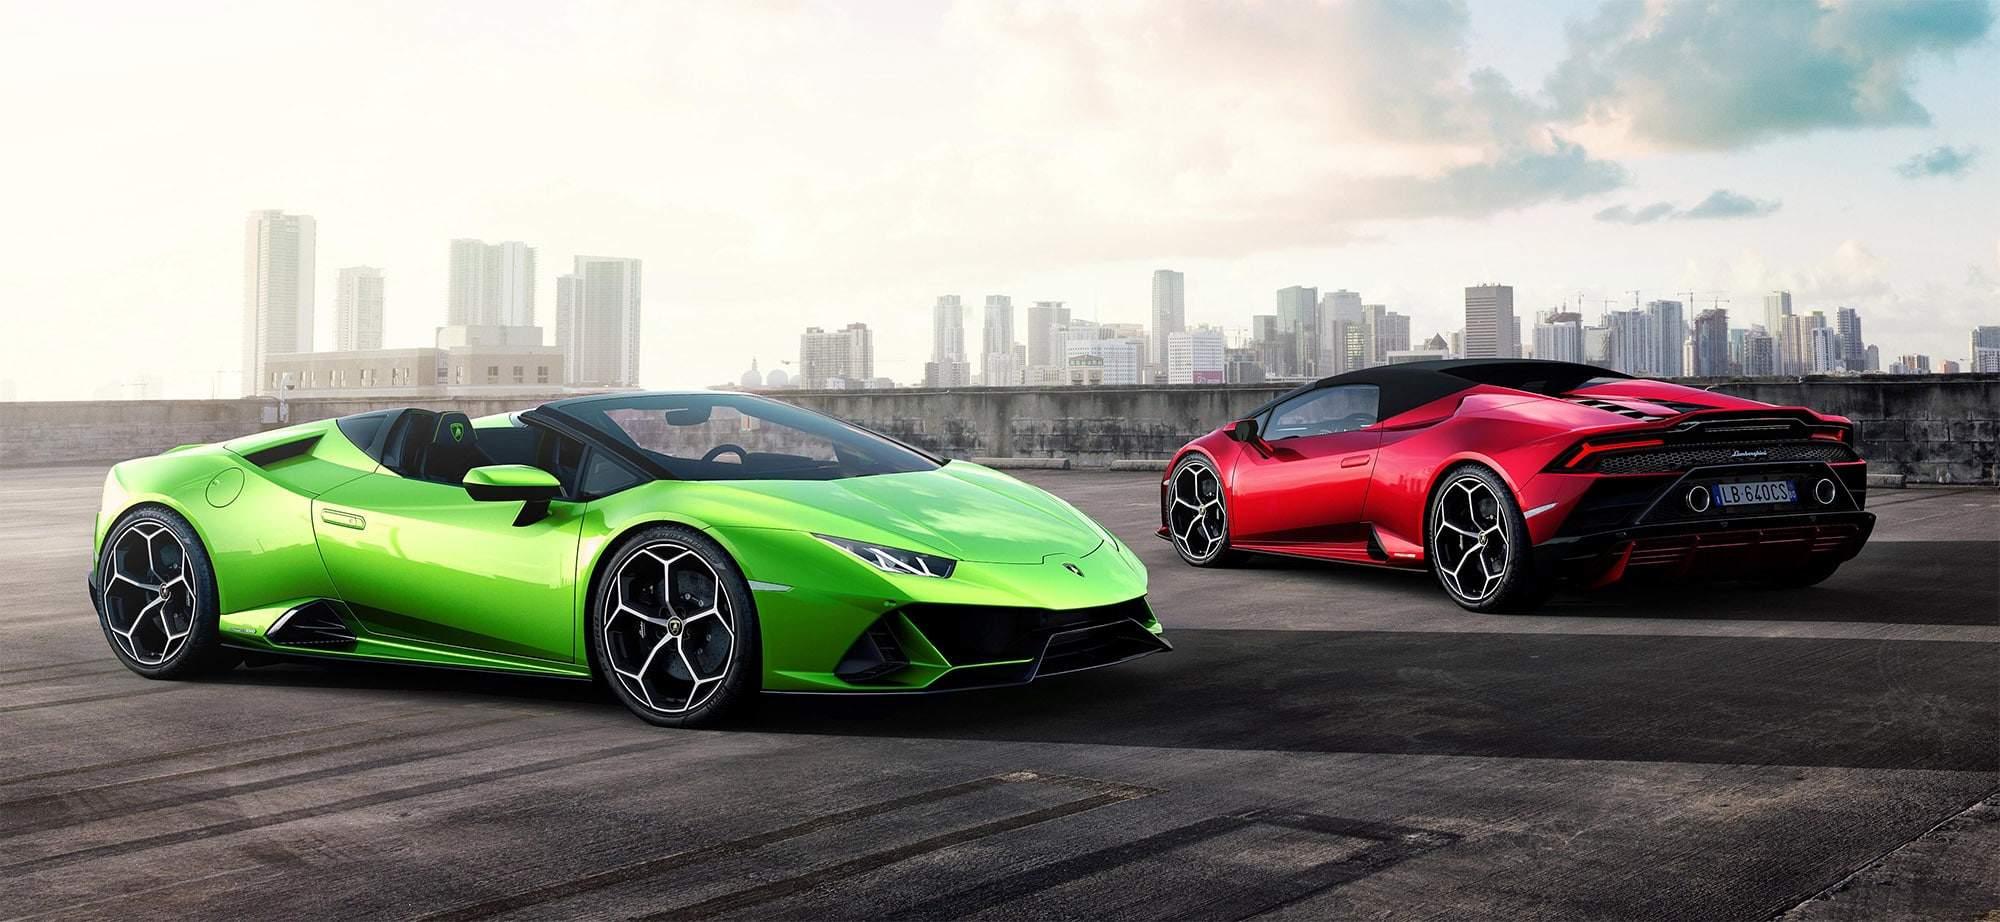 Lamborghini Huracán Evo Spyder mieten